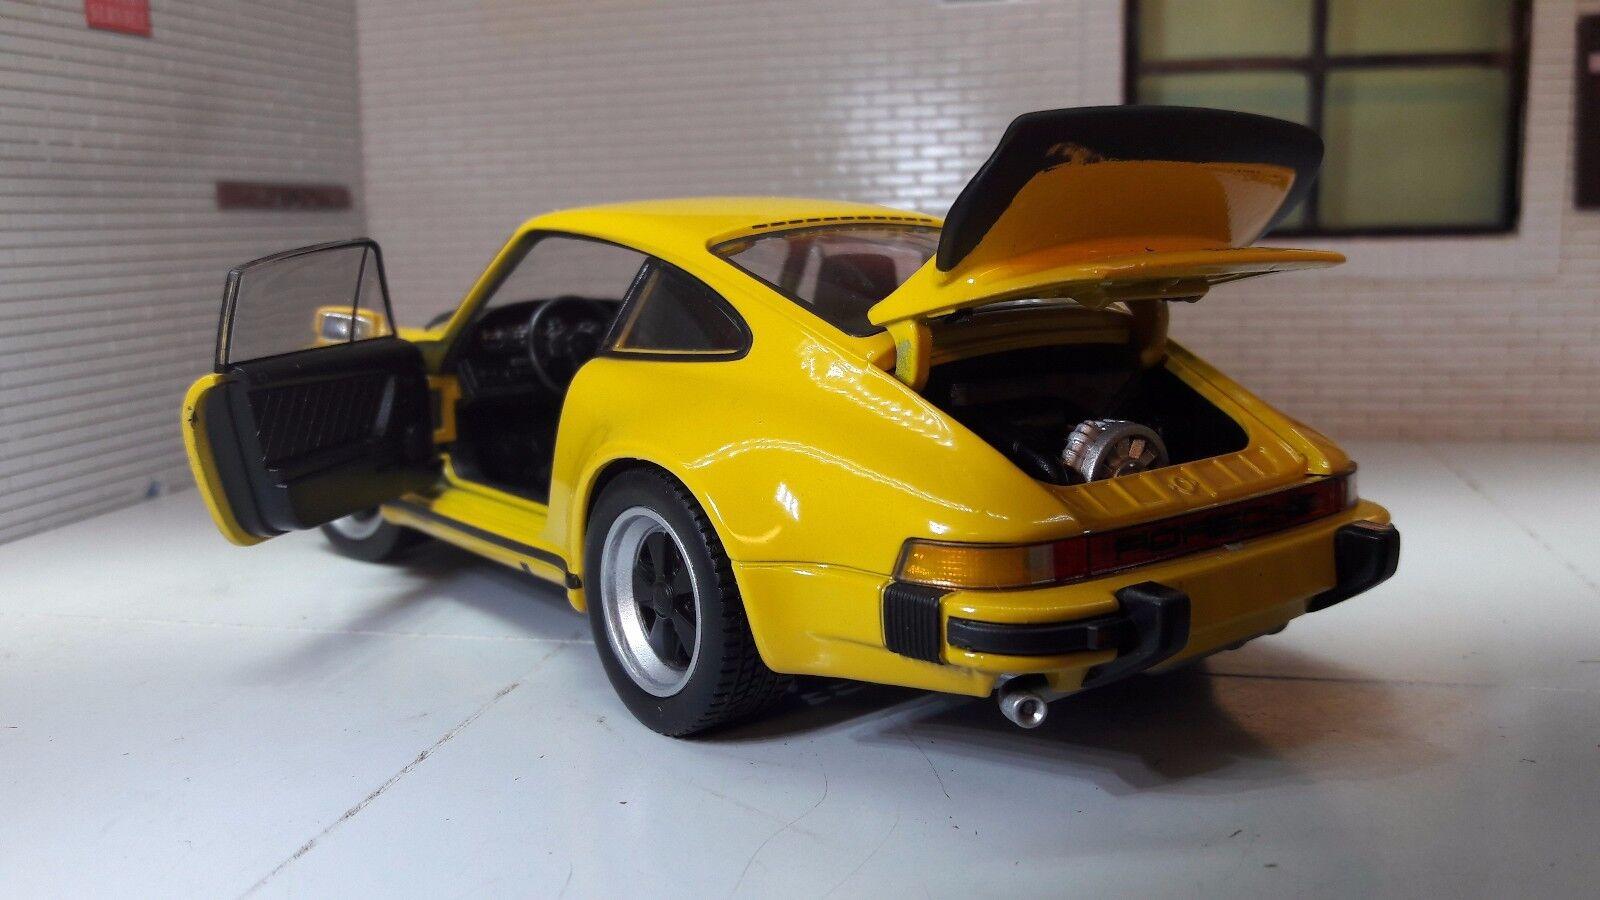 1 1 1 24 Escala 1974 Porsche 911 Turbo 3.0 Amarillo Welly Metal Fundido Coche de 8b0583